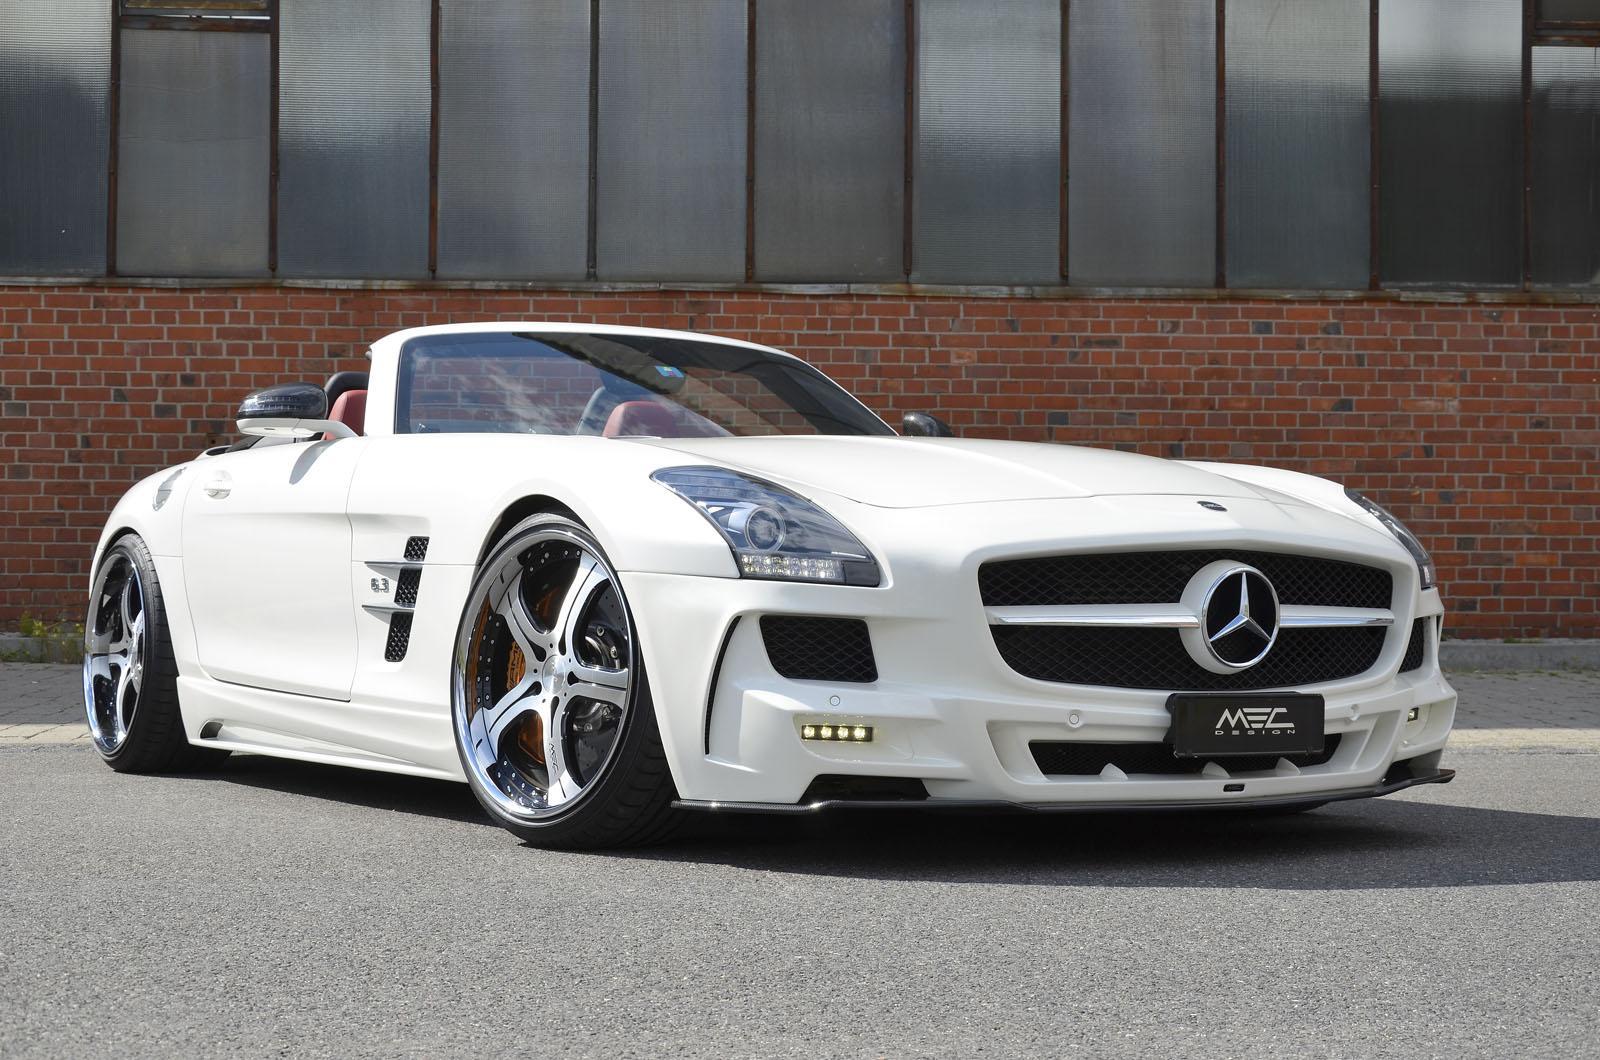 Mercedes Benz Sls Amg Roadster By Mec Design Autoevolution